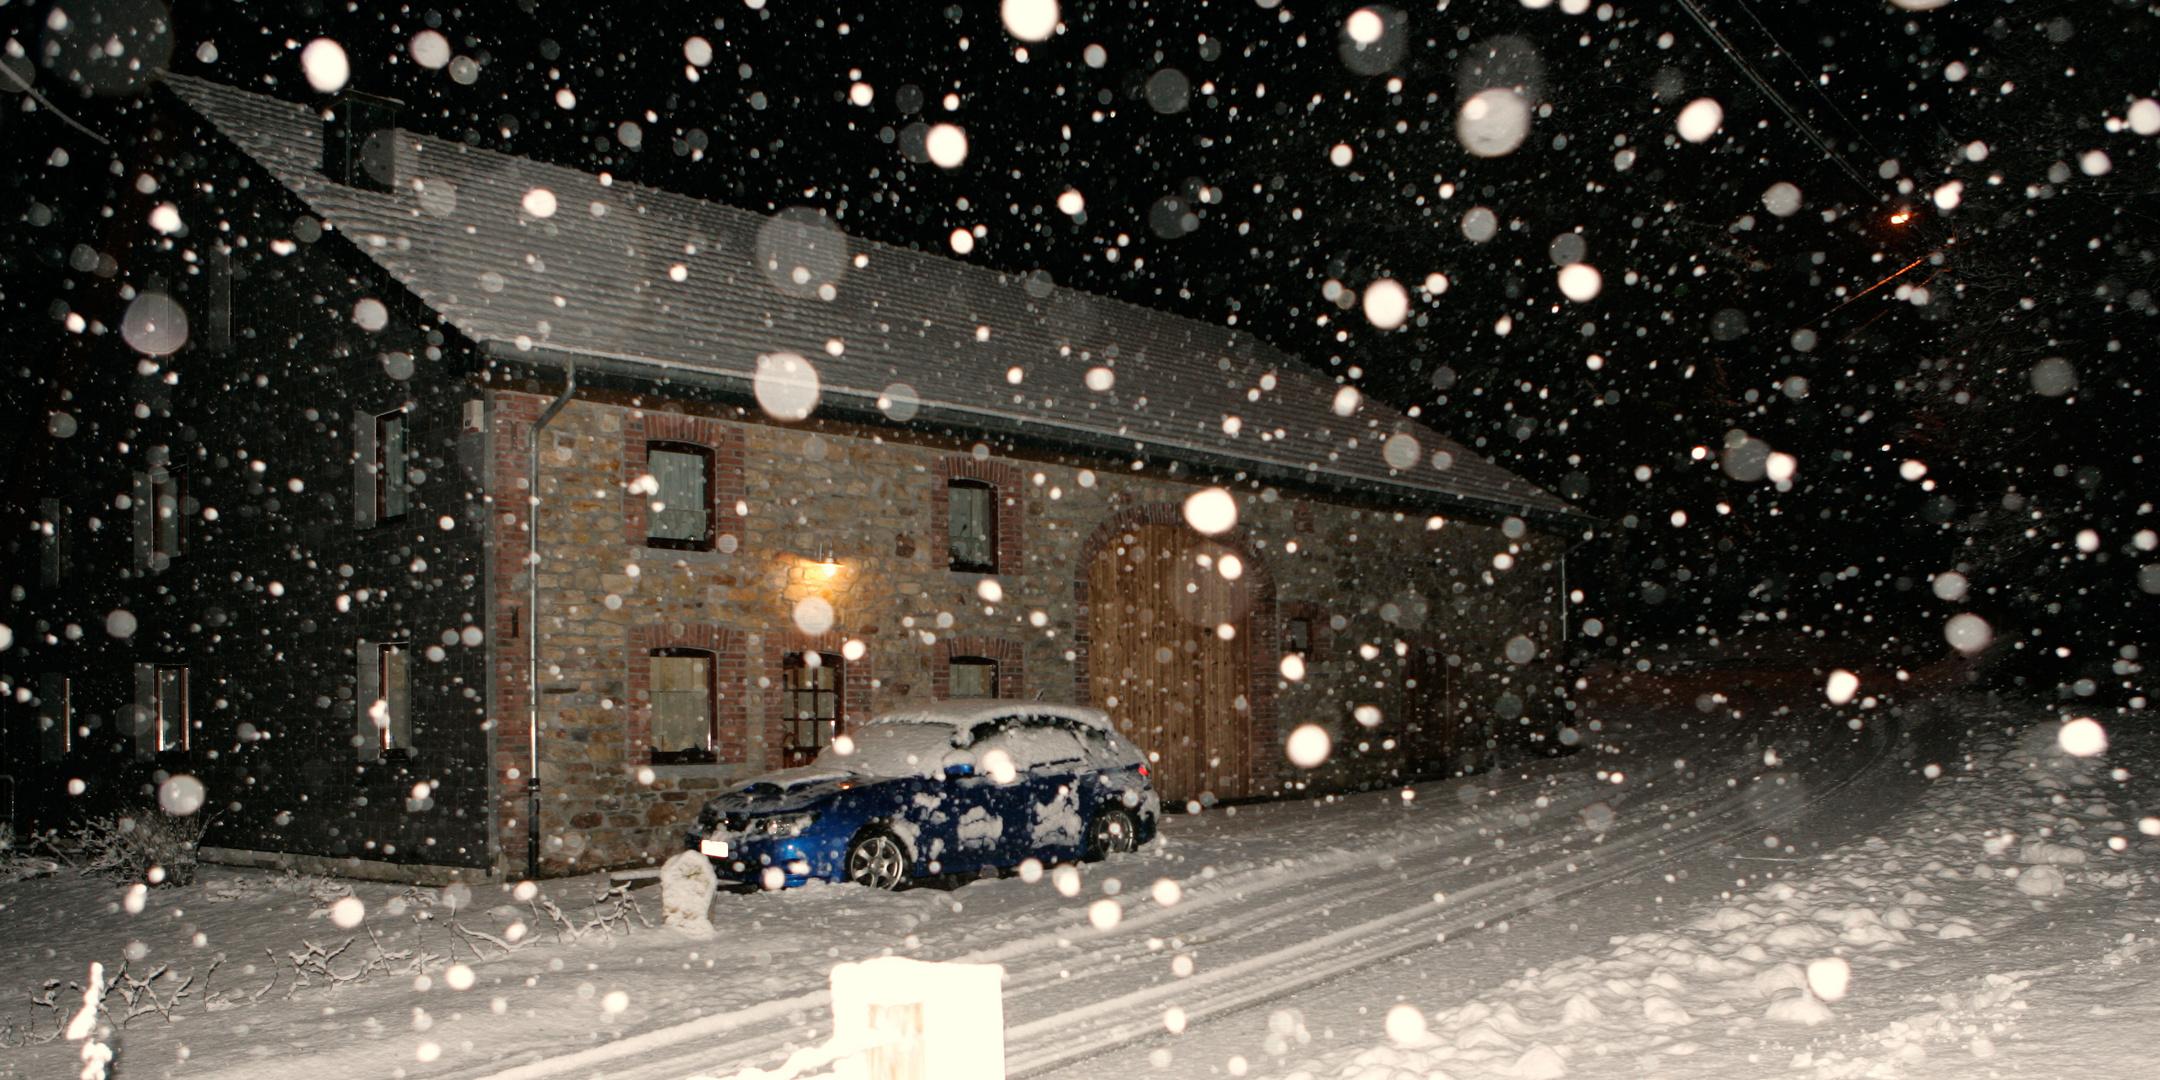 la ferme, la neige, la nuit